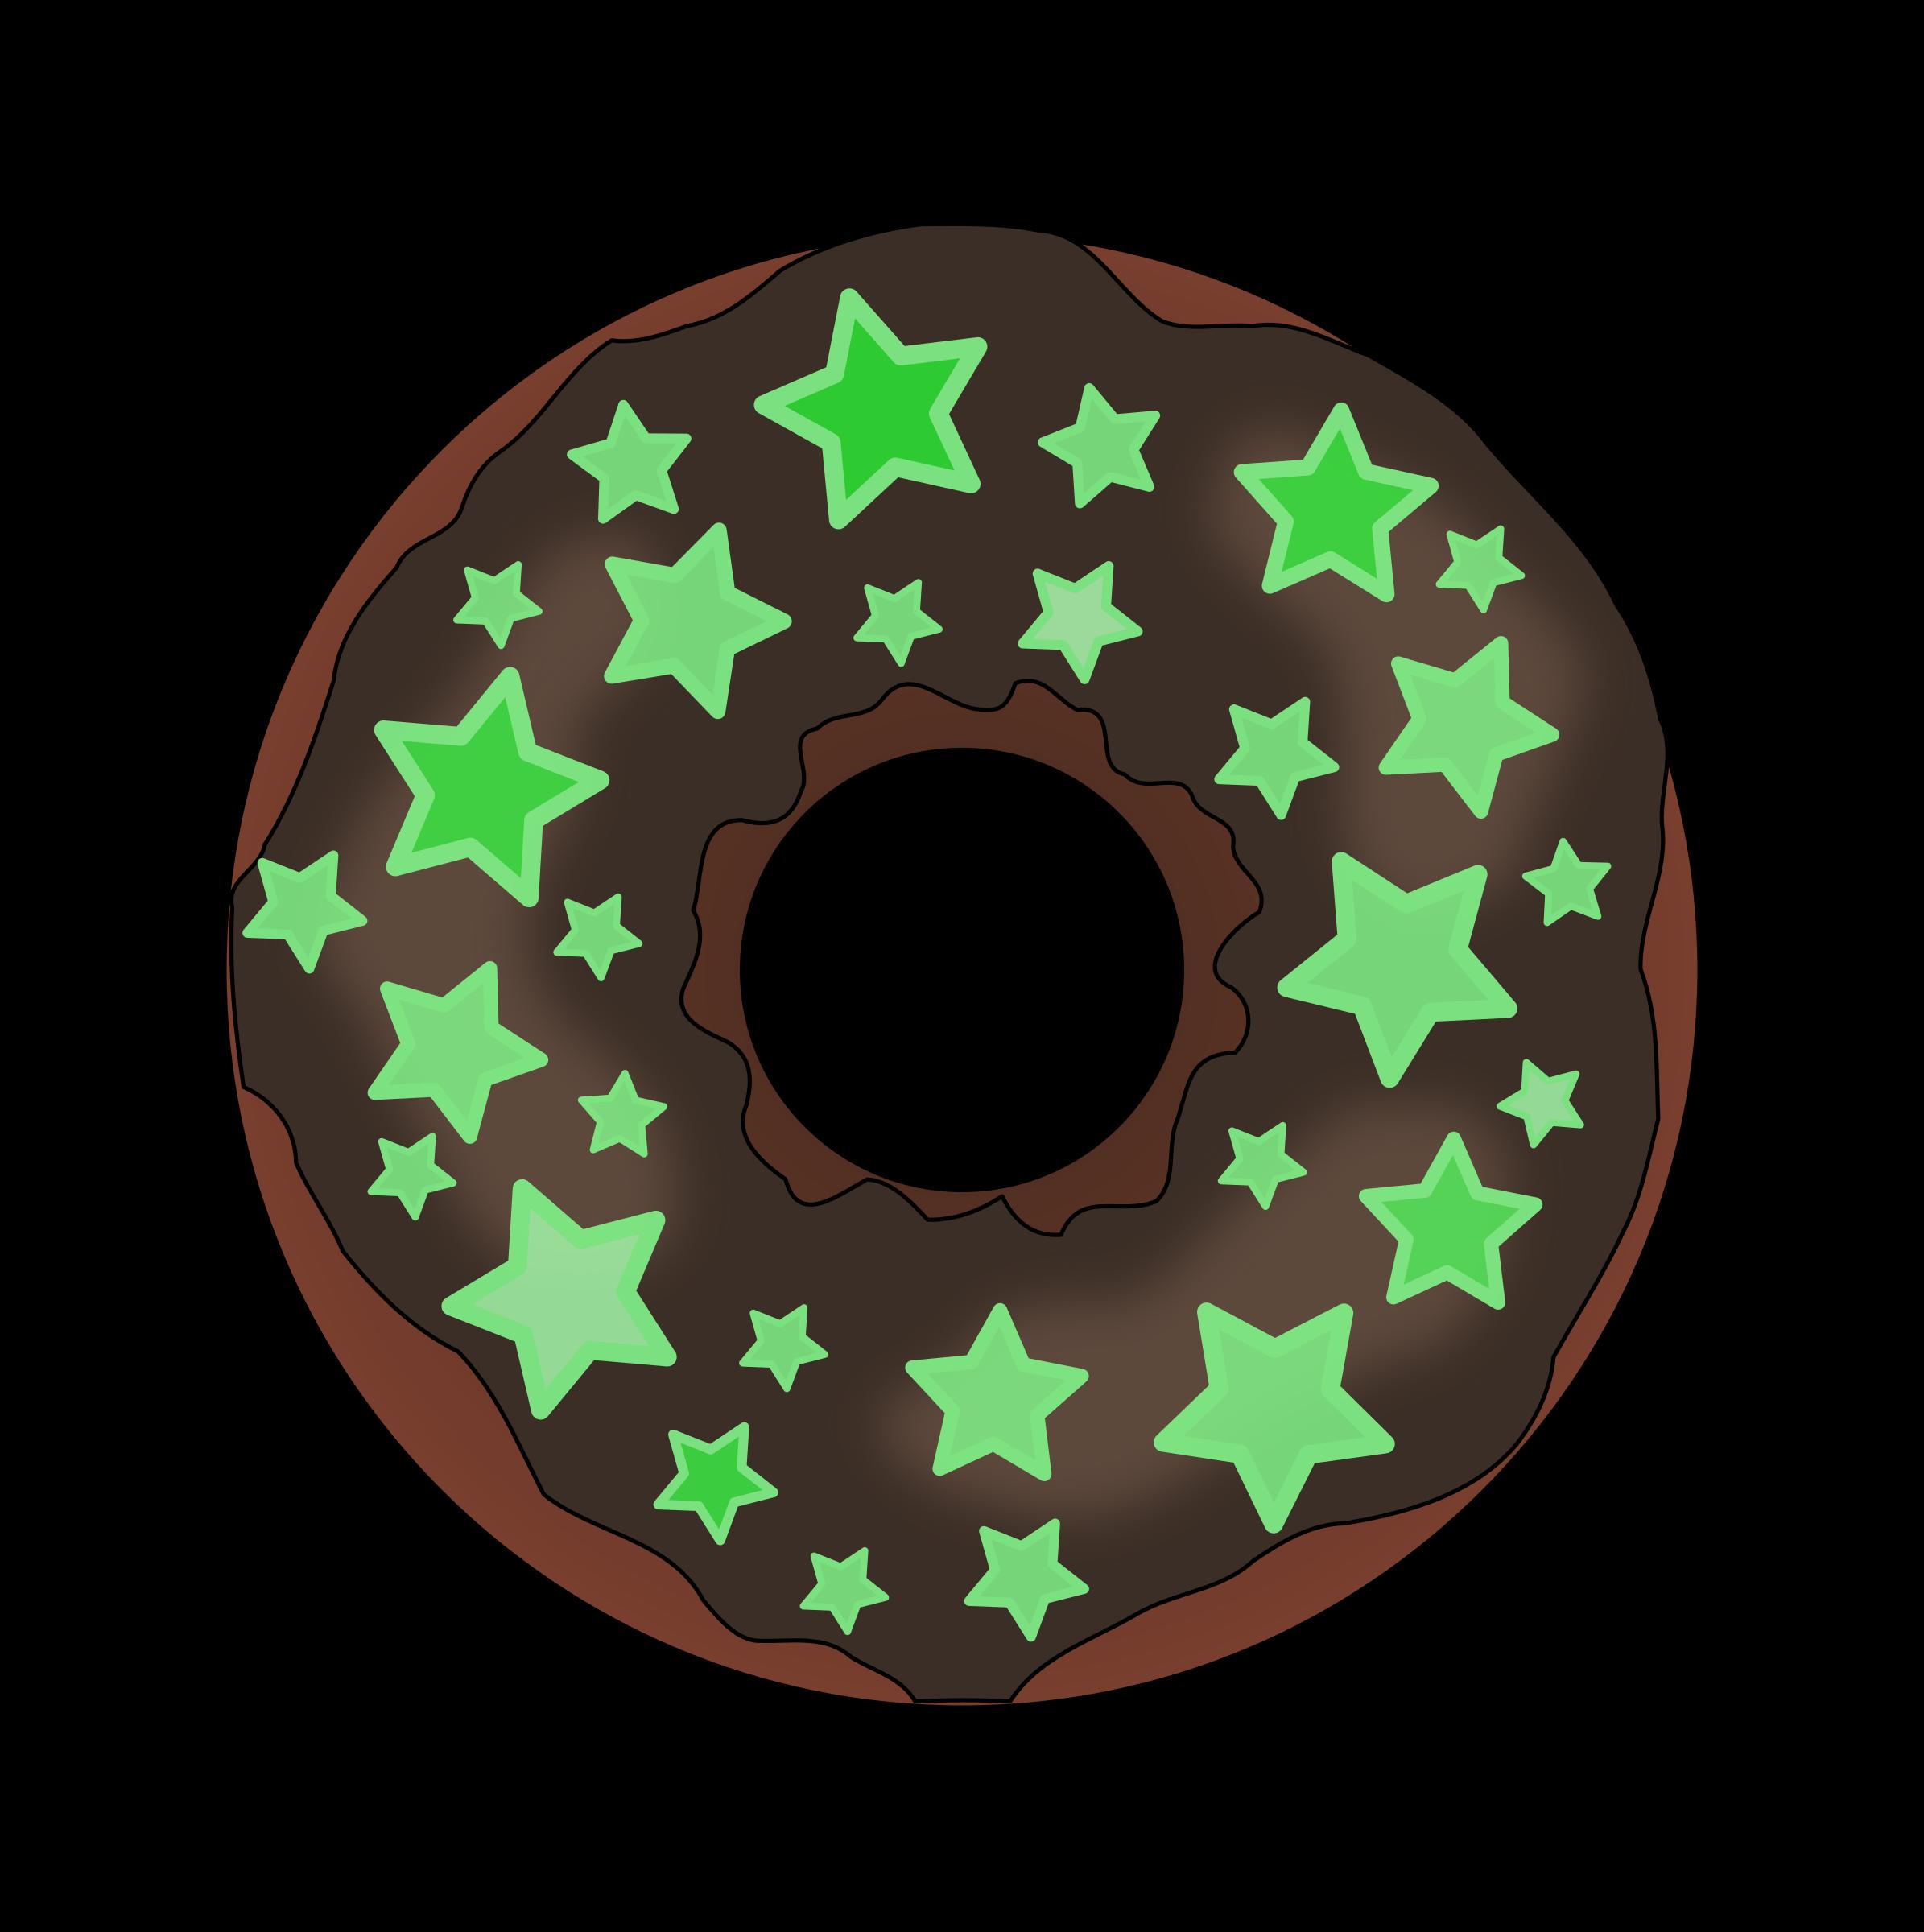 Donuts clipart doughnut, Donuts doughnut Transparent FREE.